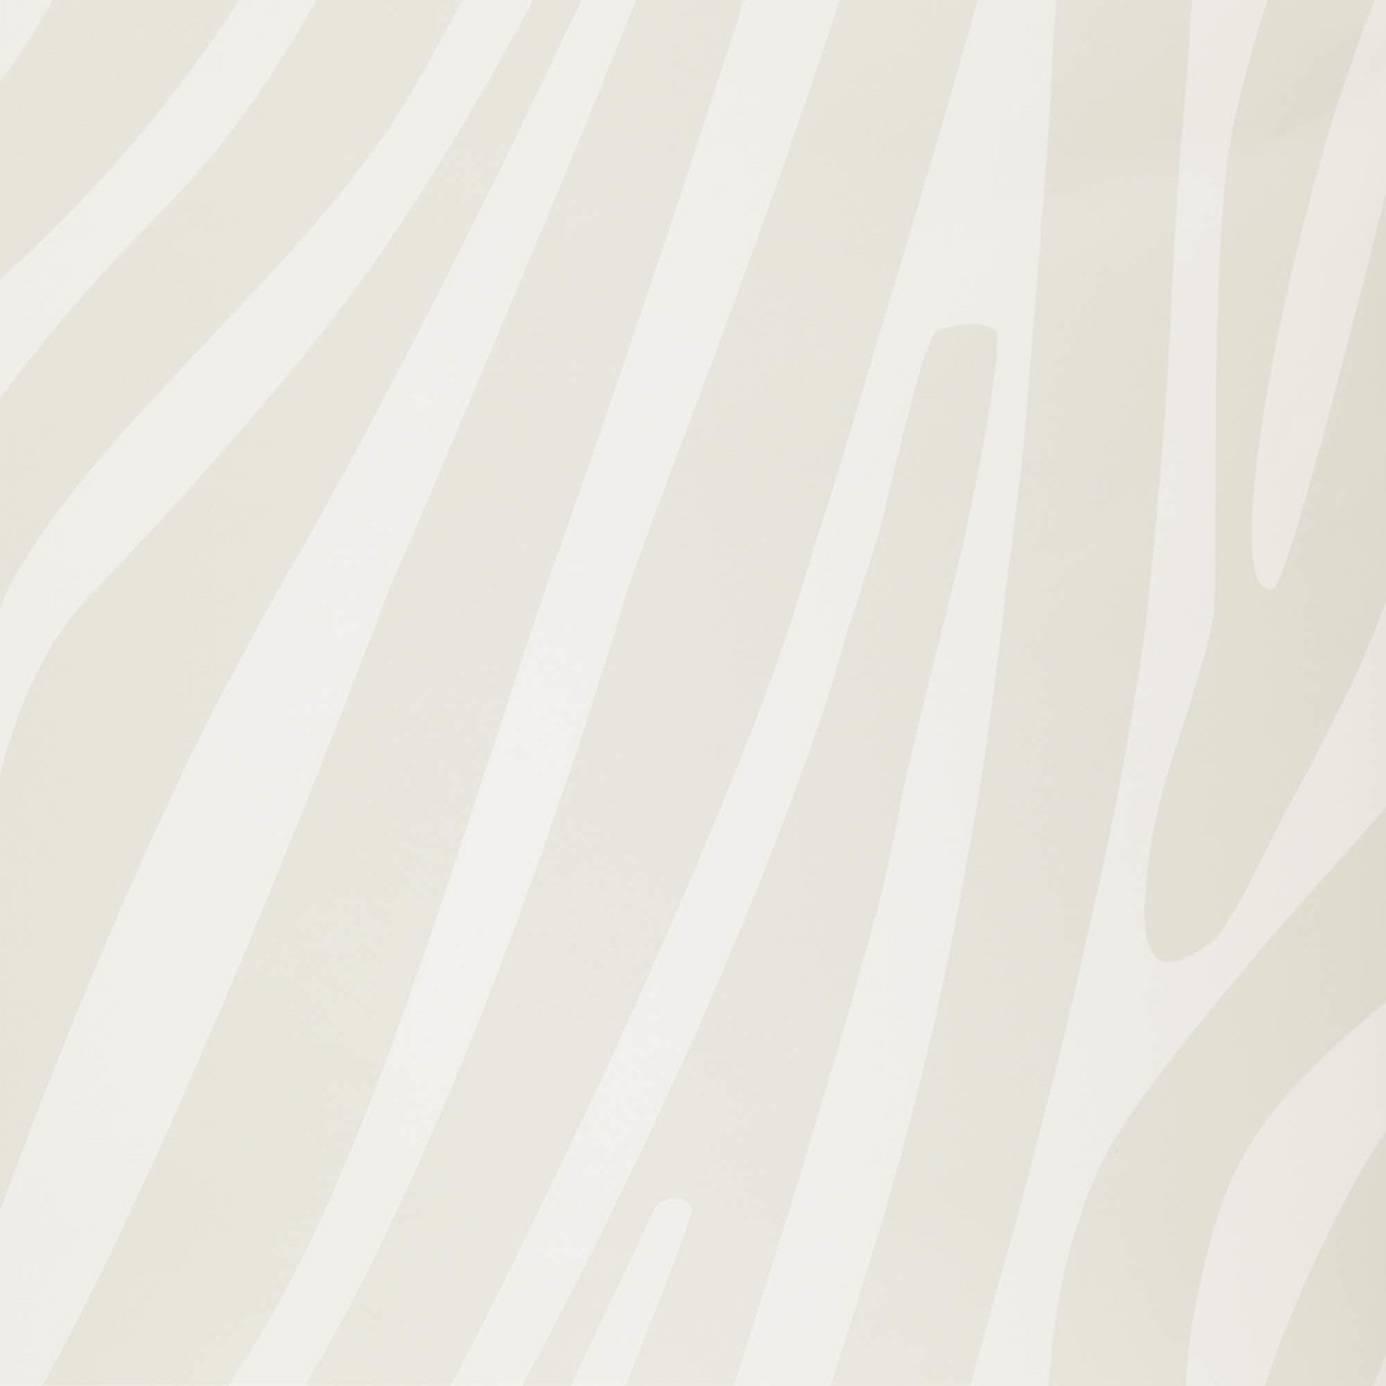 Damara Wallpaper   Flake DAMARA22   Wemyss Jungle Club 1386x1386